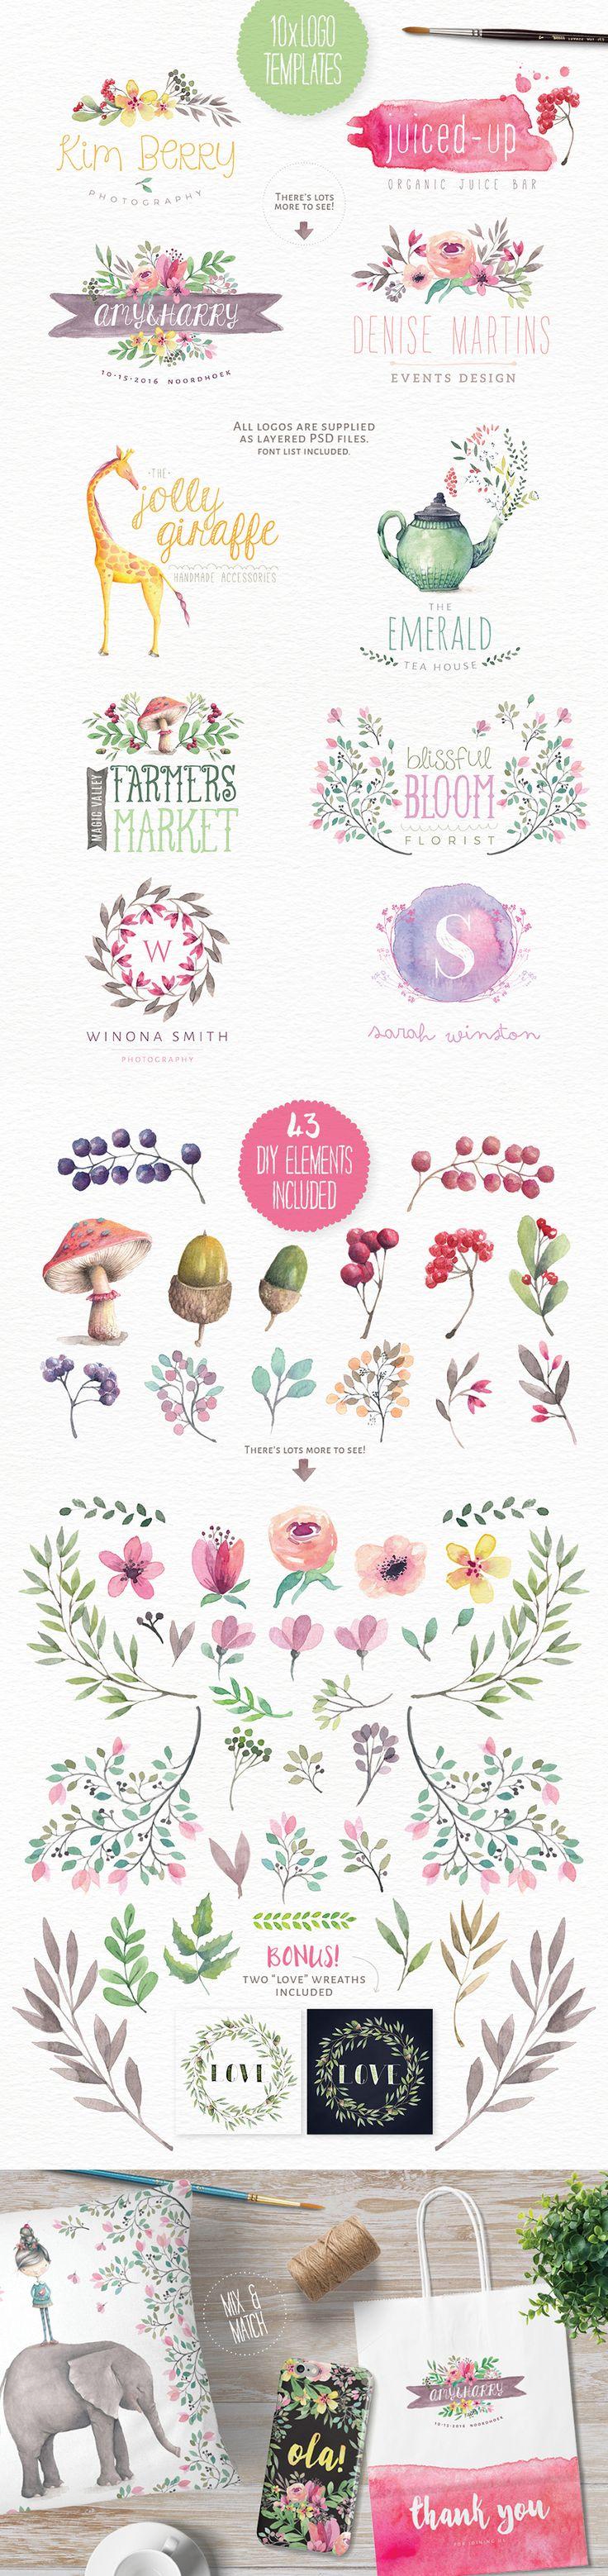 The Creative Designer's Complete Illustration Kit